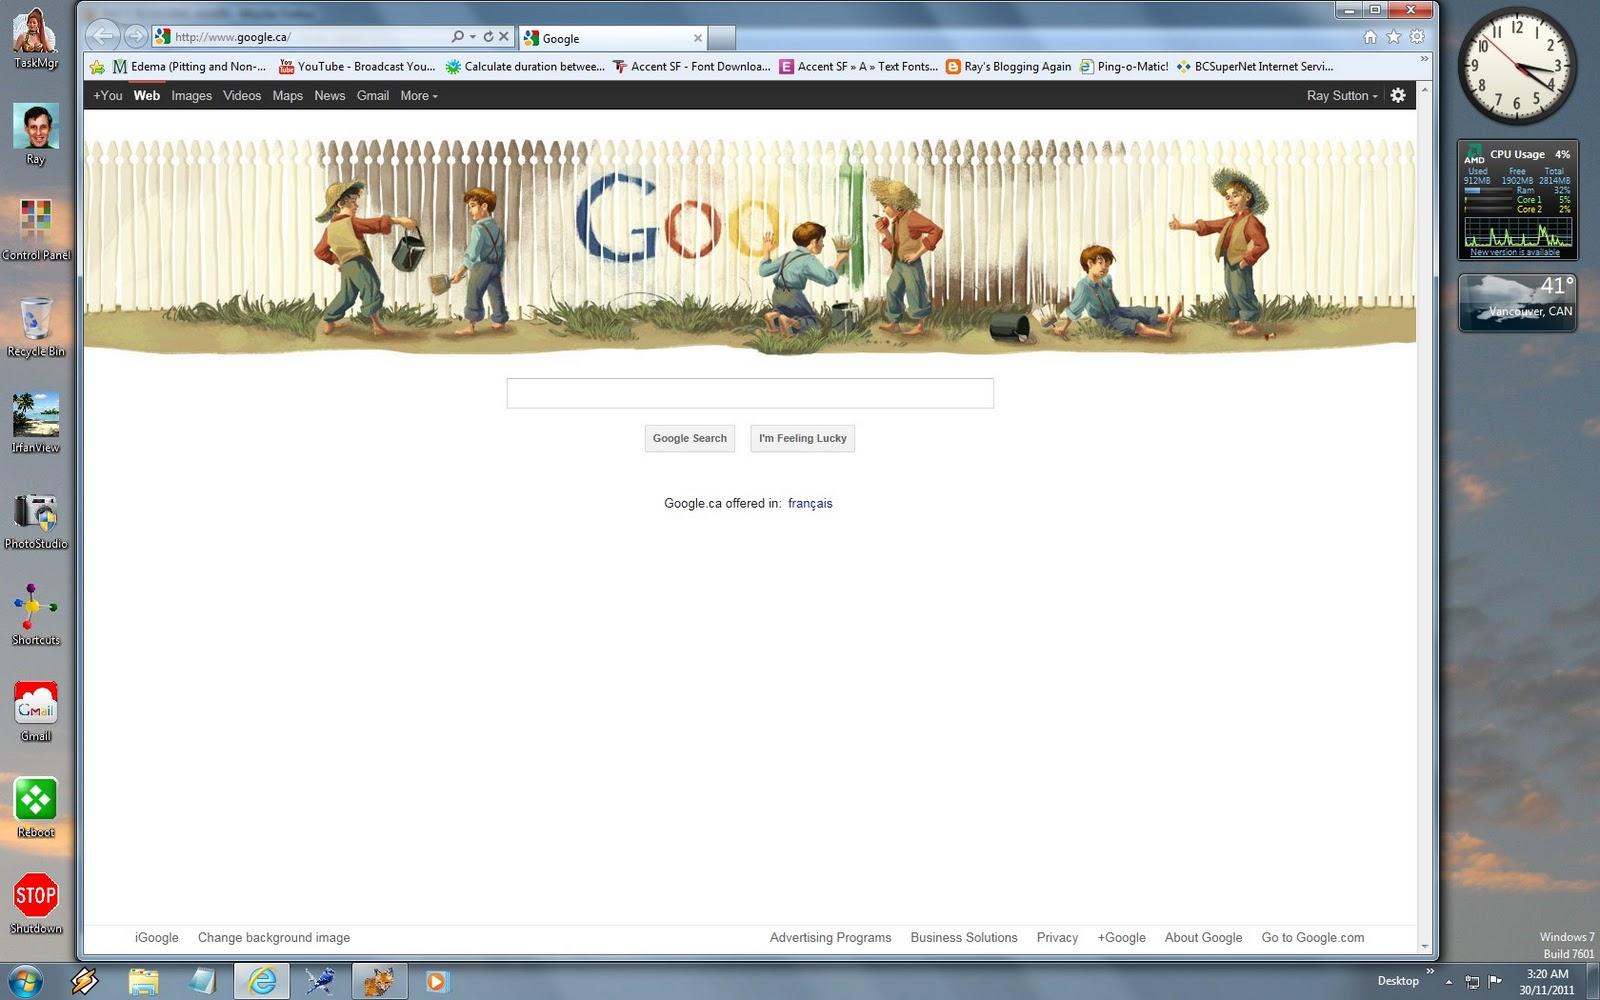 http://3.bp.blogspot.com/-3Njrmkil3LA/TtYWEtLznGI/AAAAAAAAEP4/dl0w6vl2s-c/s1600/Mark+Twain%2527s+Birthday.jpg